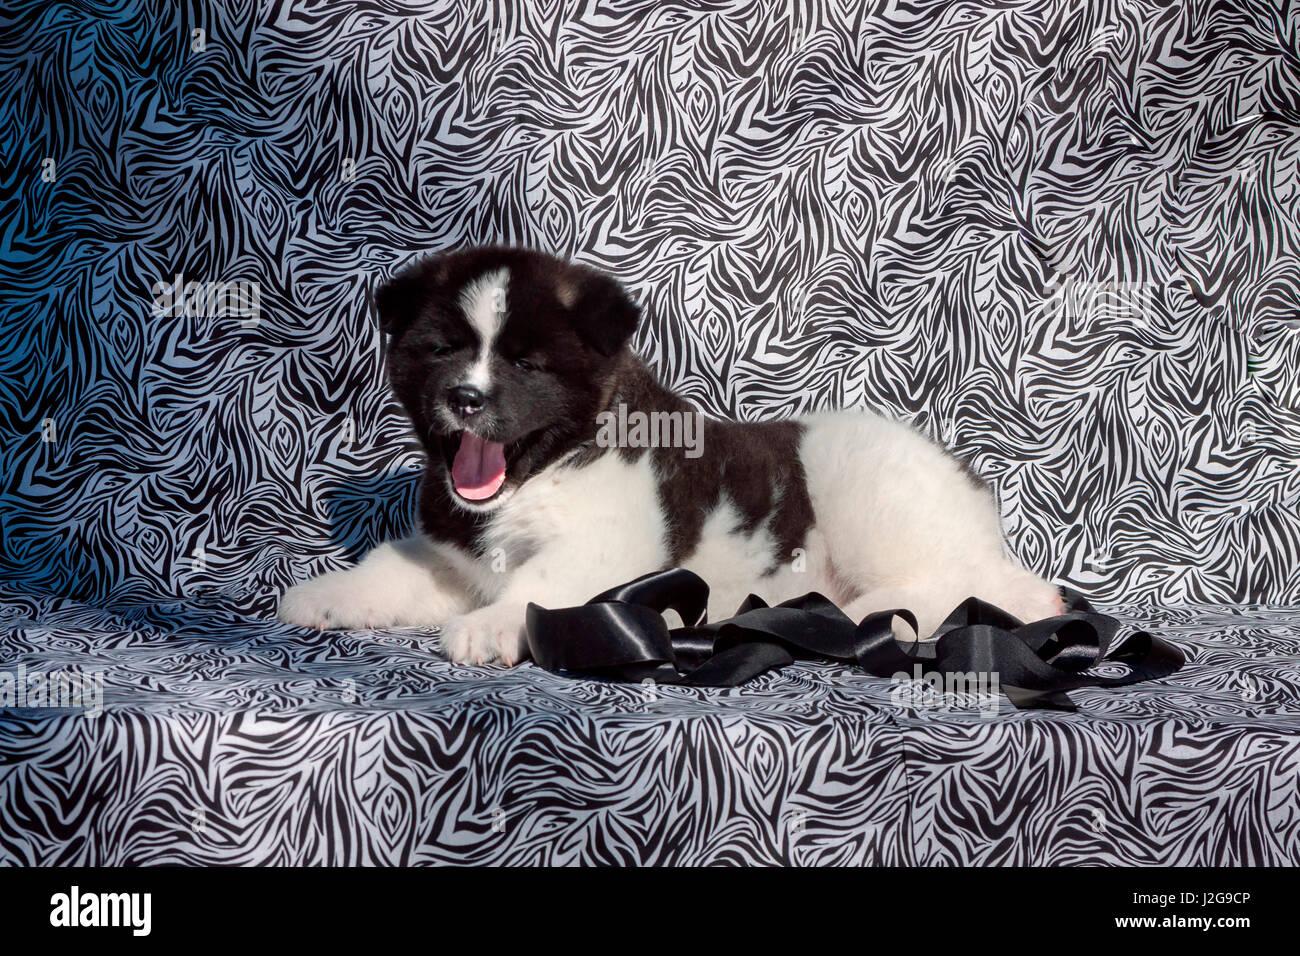 Akita puppy lying on black and white print fabric (MR & PR) - Stock Image